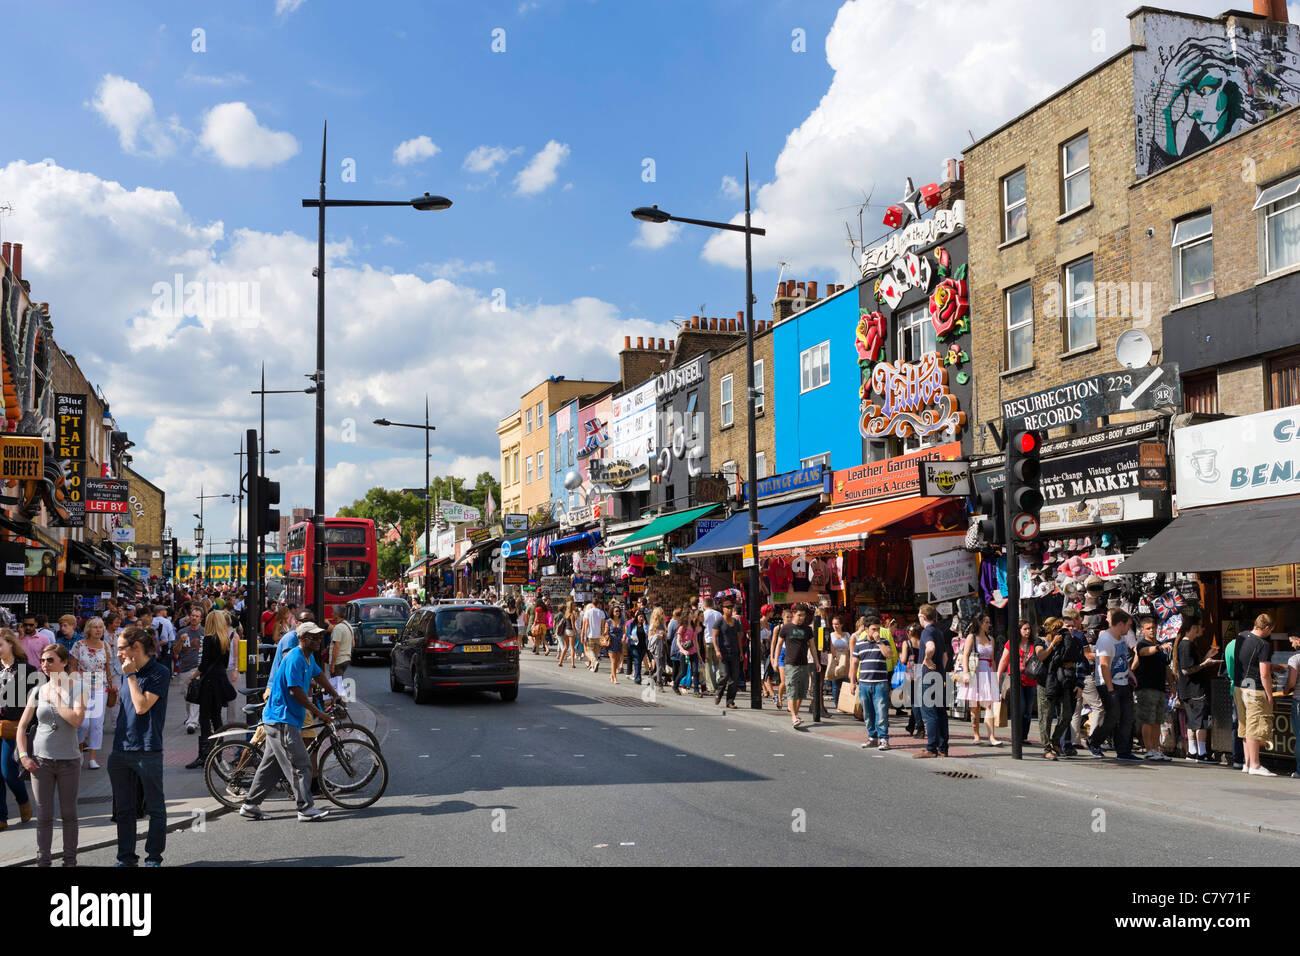 Shops on Camden High Street, Camden Town, North London